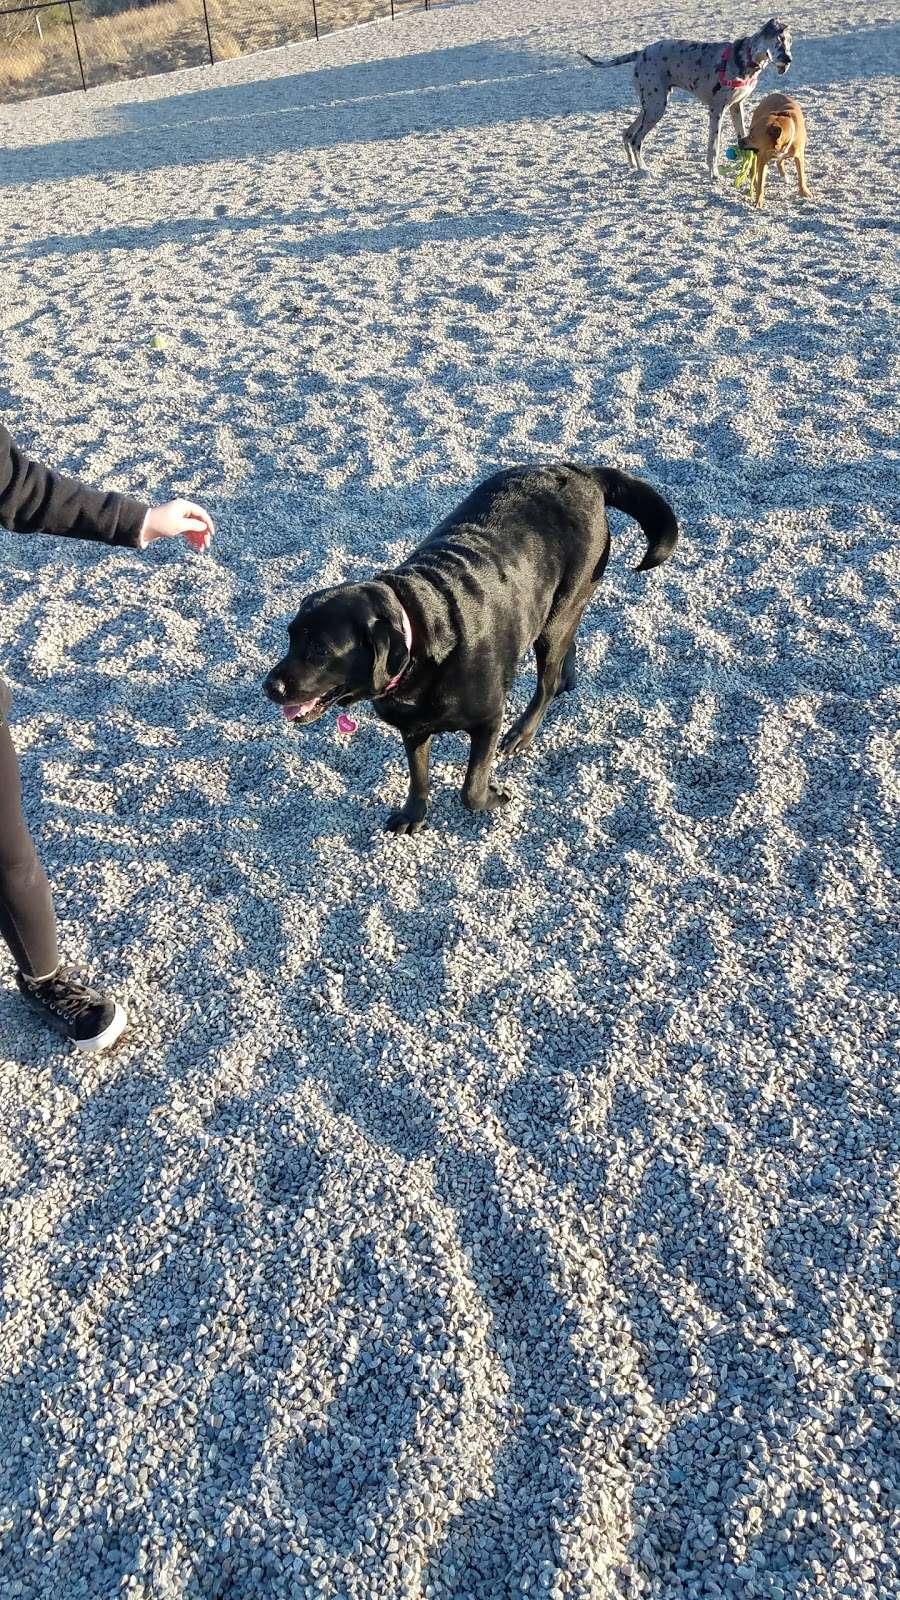 Boneyard Dog Park - park  | Photo 2 of 10 | Address: Kingston, MA 02364, USA